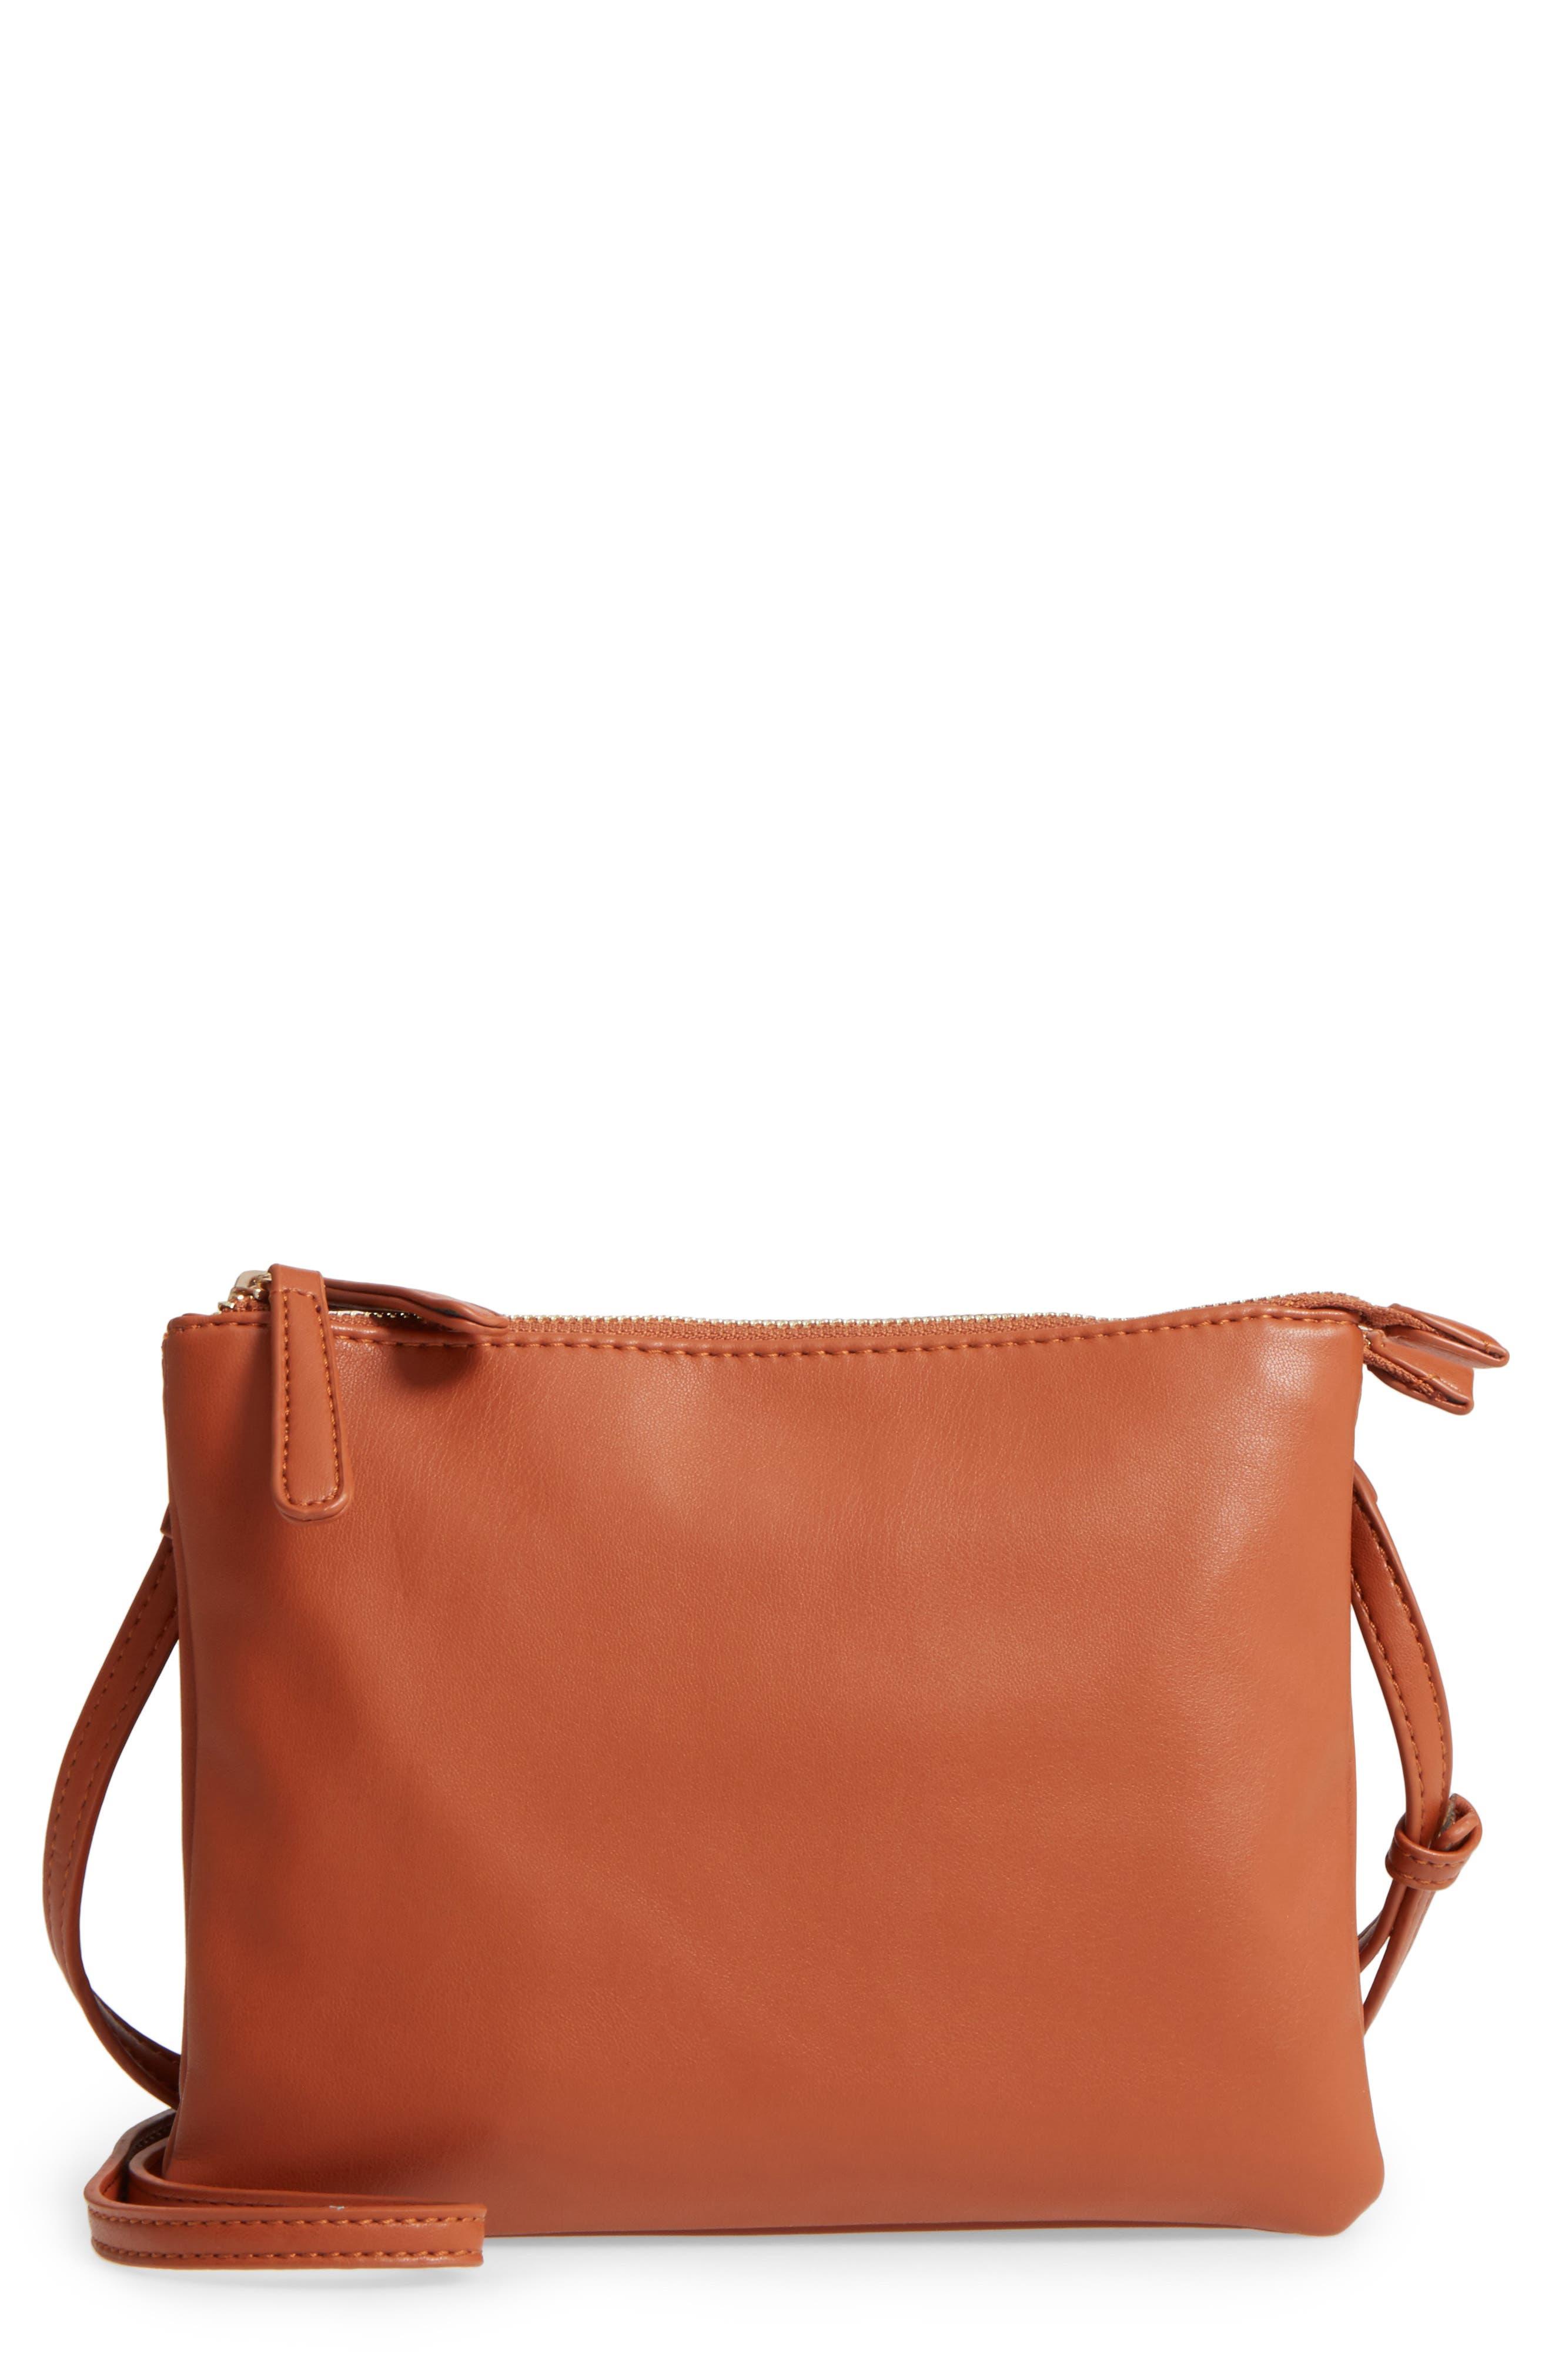 Madden Faux Leather Pouch Crossbody Bag,                             Main thumbnail 1, color,                             Cognac